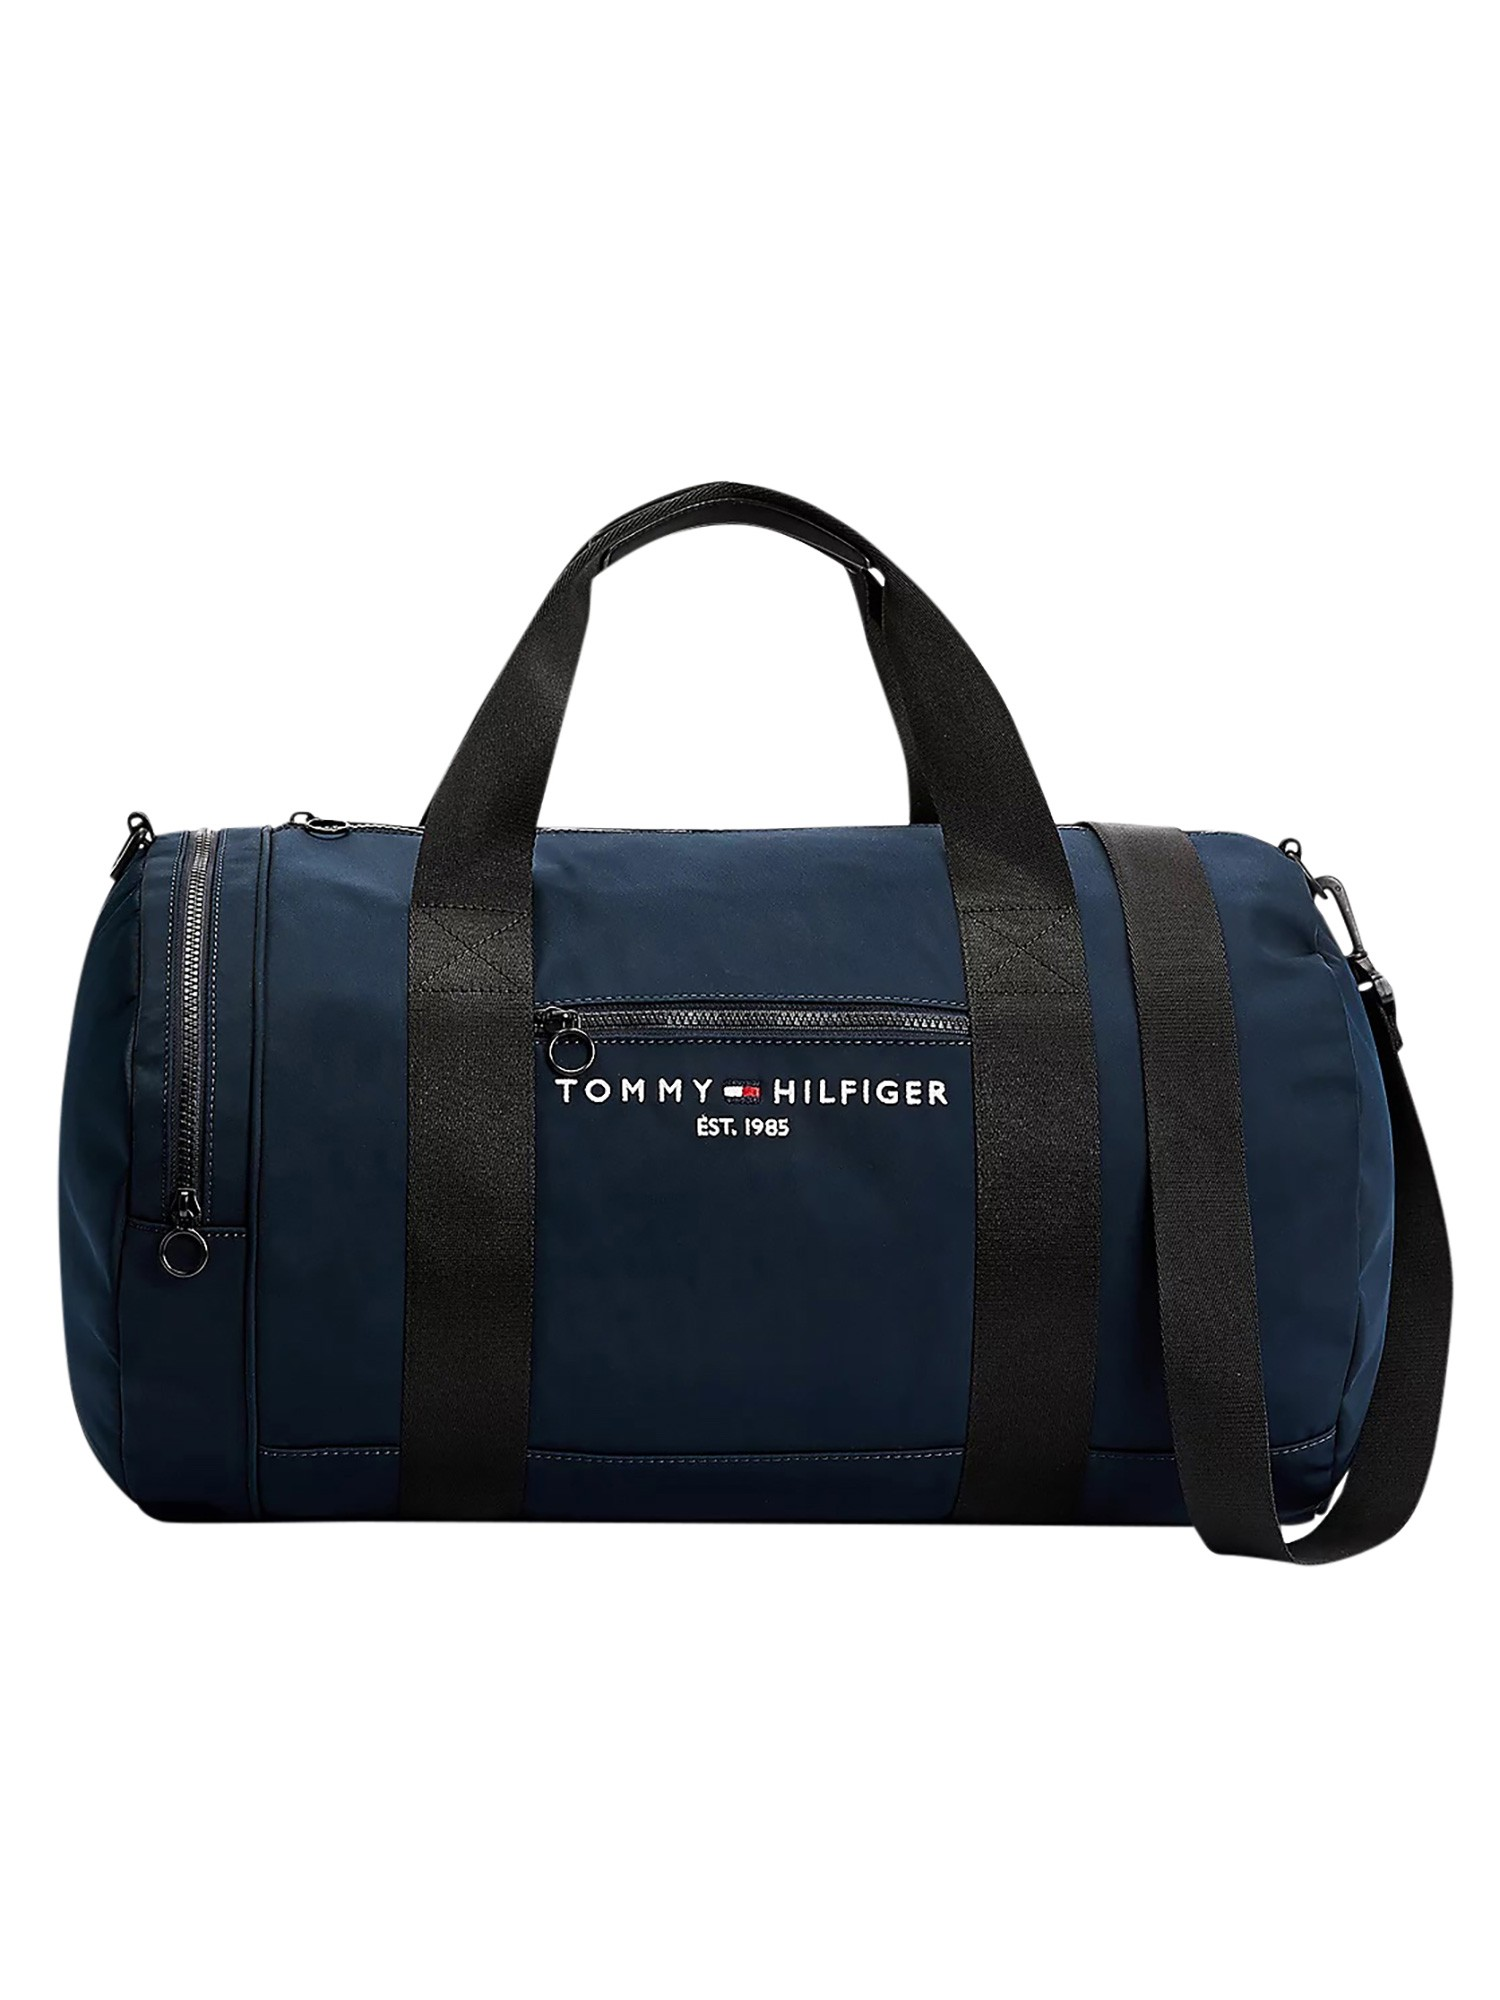 Established Duffle Bag